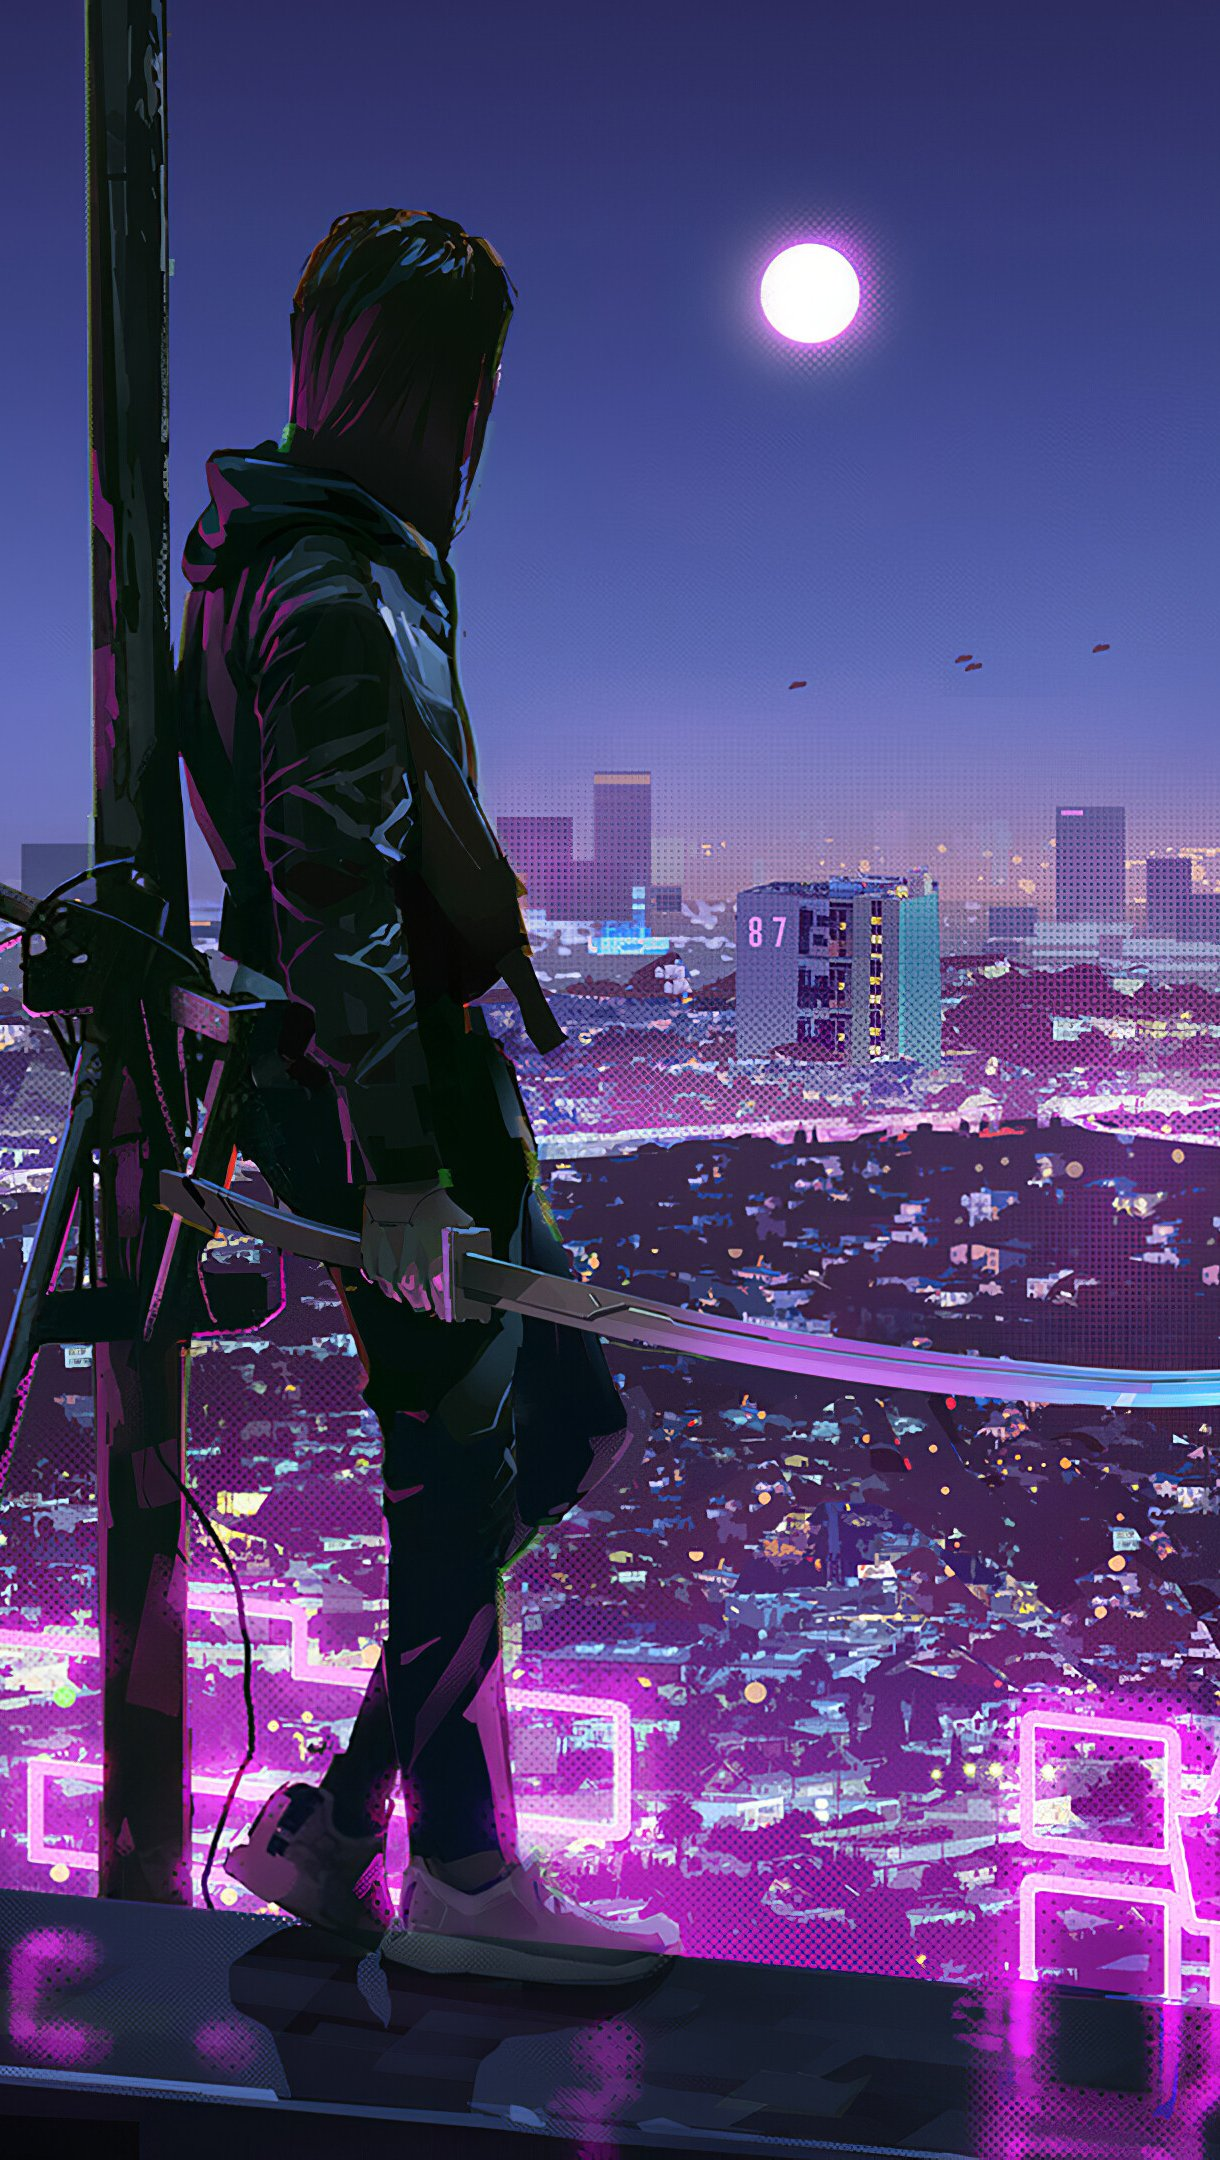 Wallpaper Ninja Katana Sci-Fi City Neon Lights Vertical